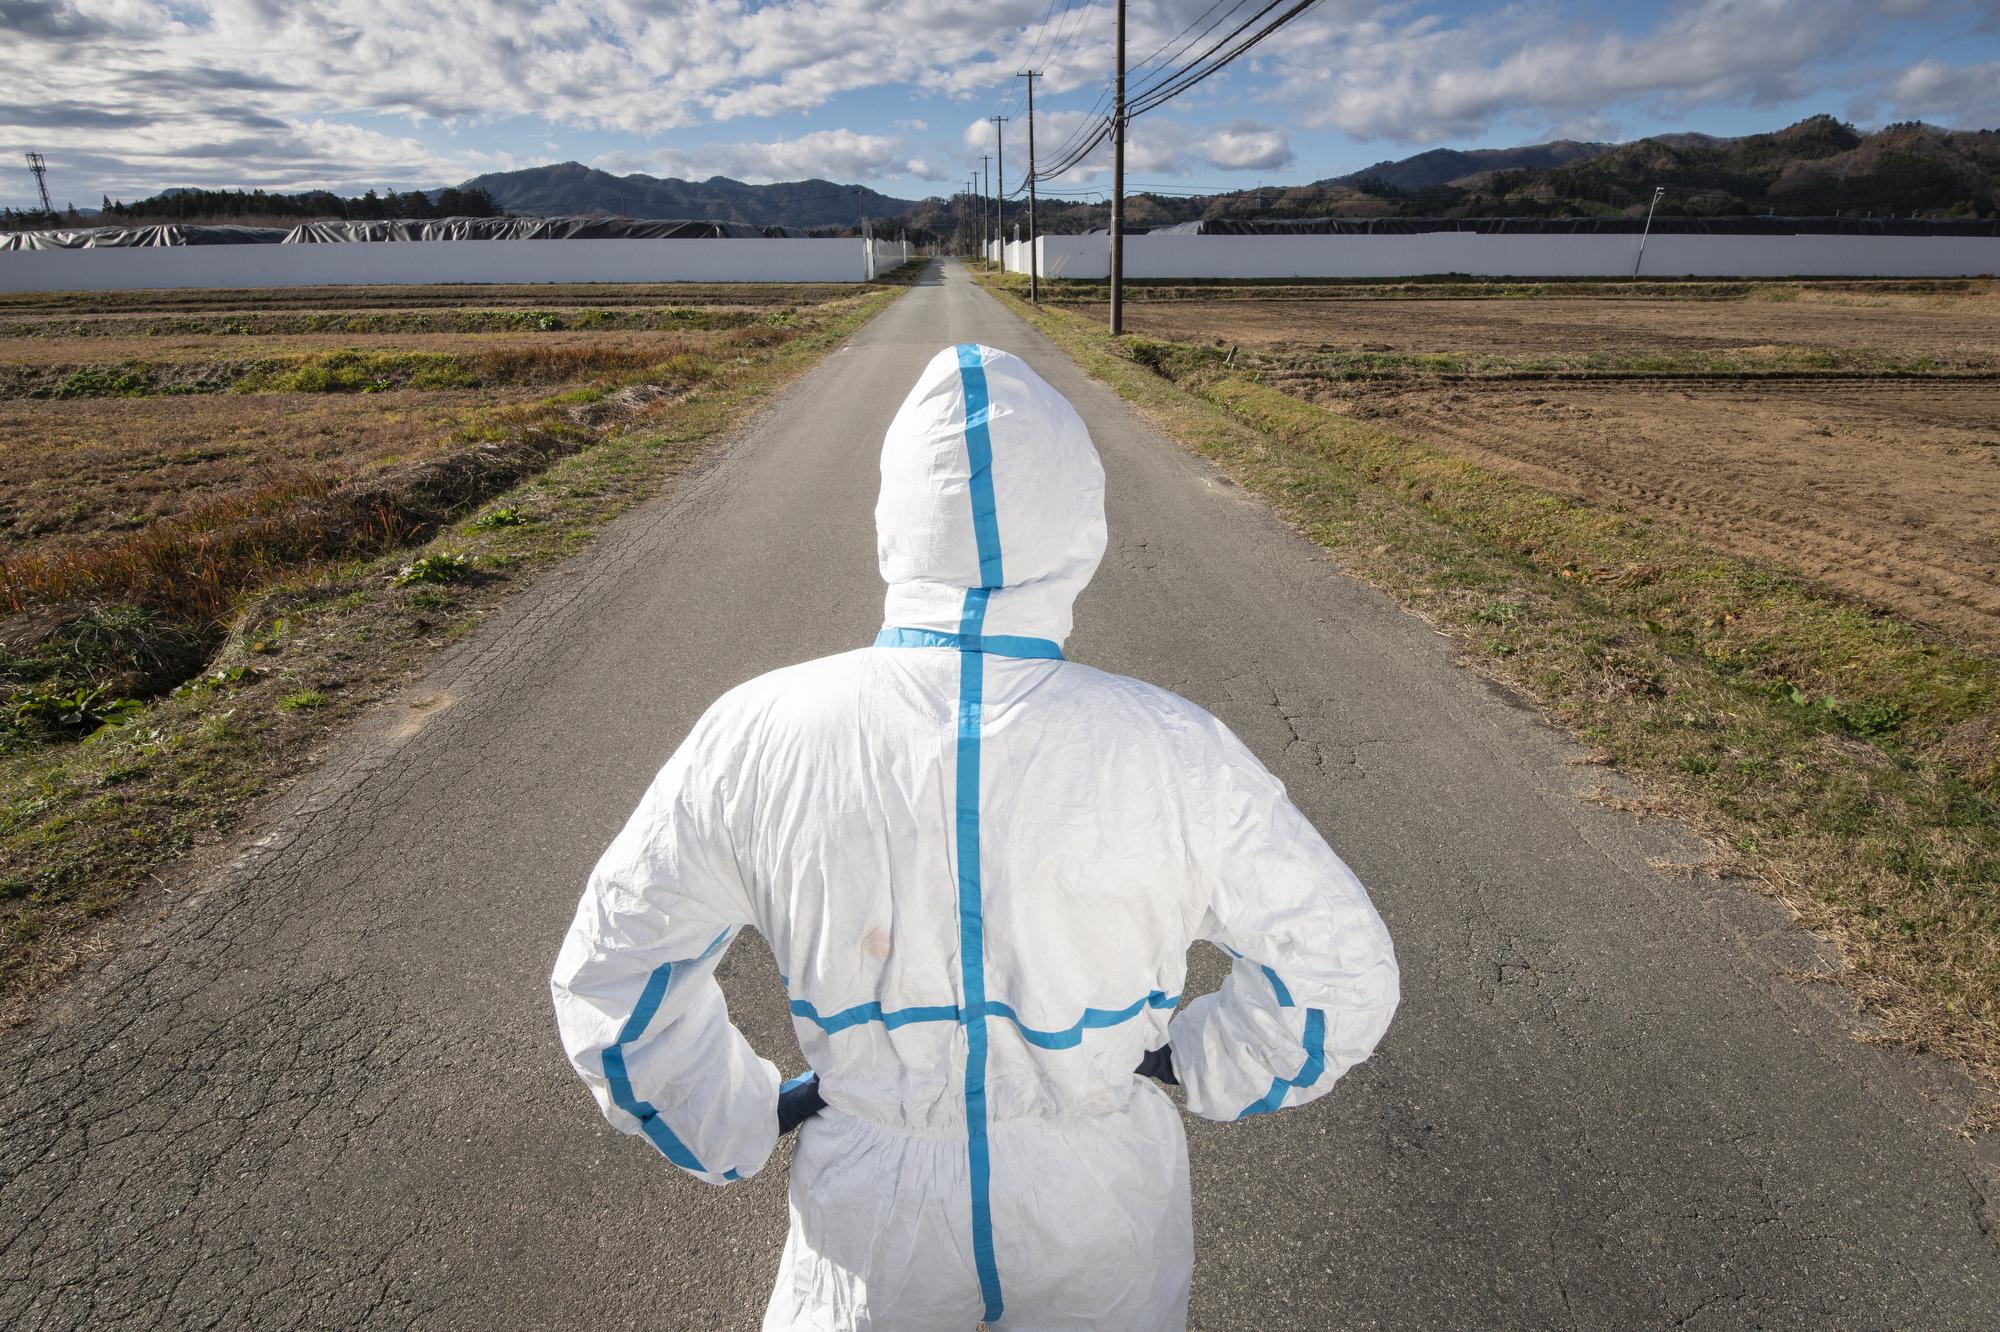 The Ghost Towns of Fukushima